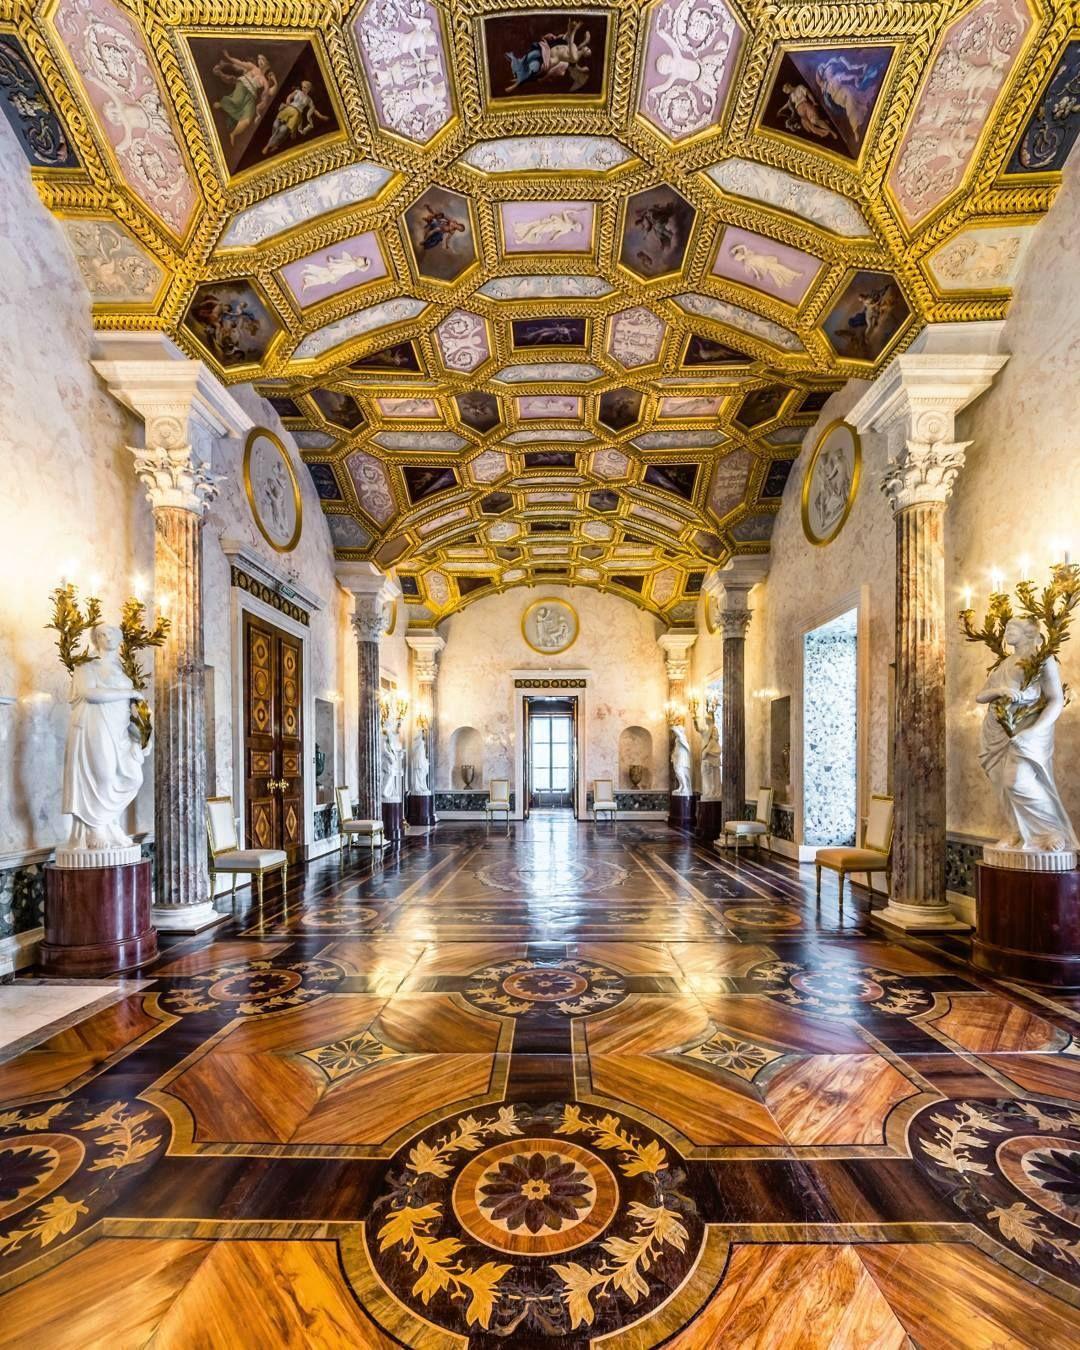 Amazing Interior Design: Agate Rooms Of The Catherine Palace, Pushkin